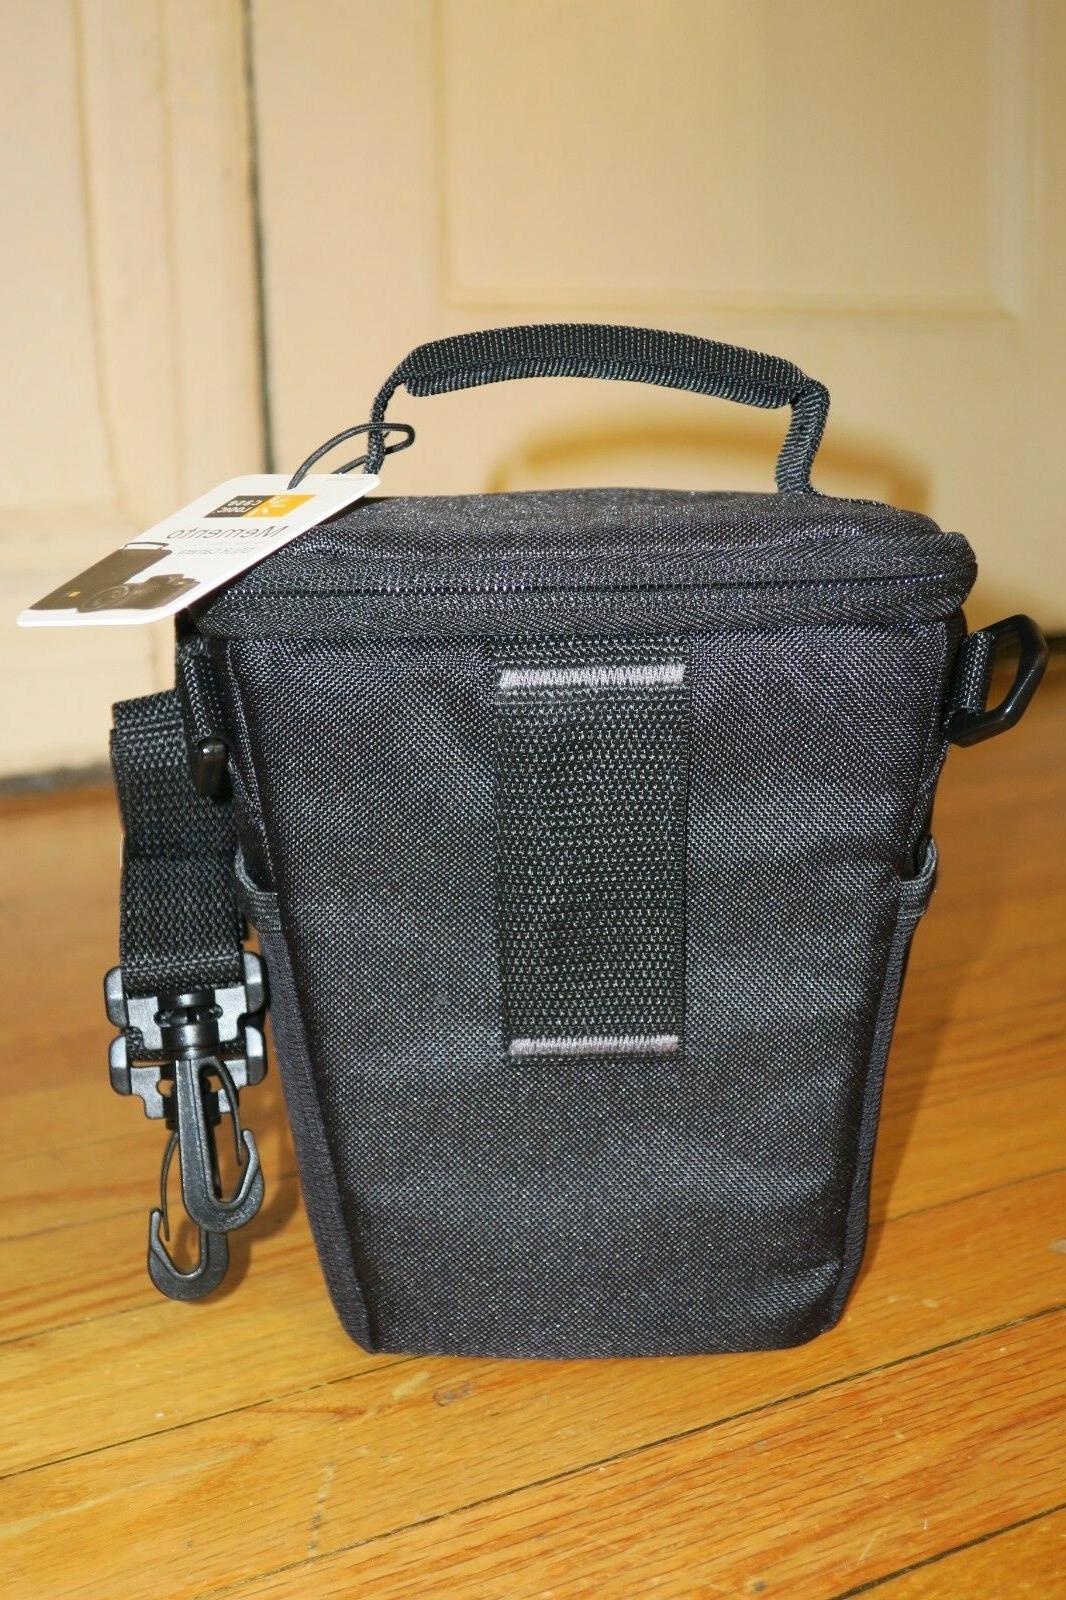 Case Logic Memento Camera Holster